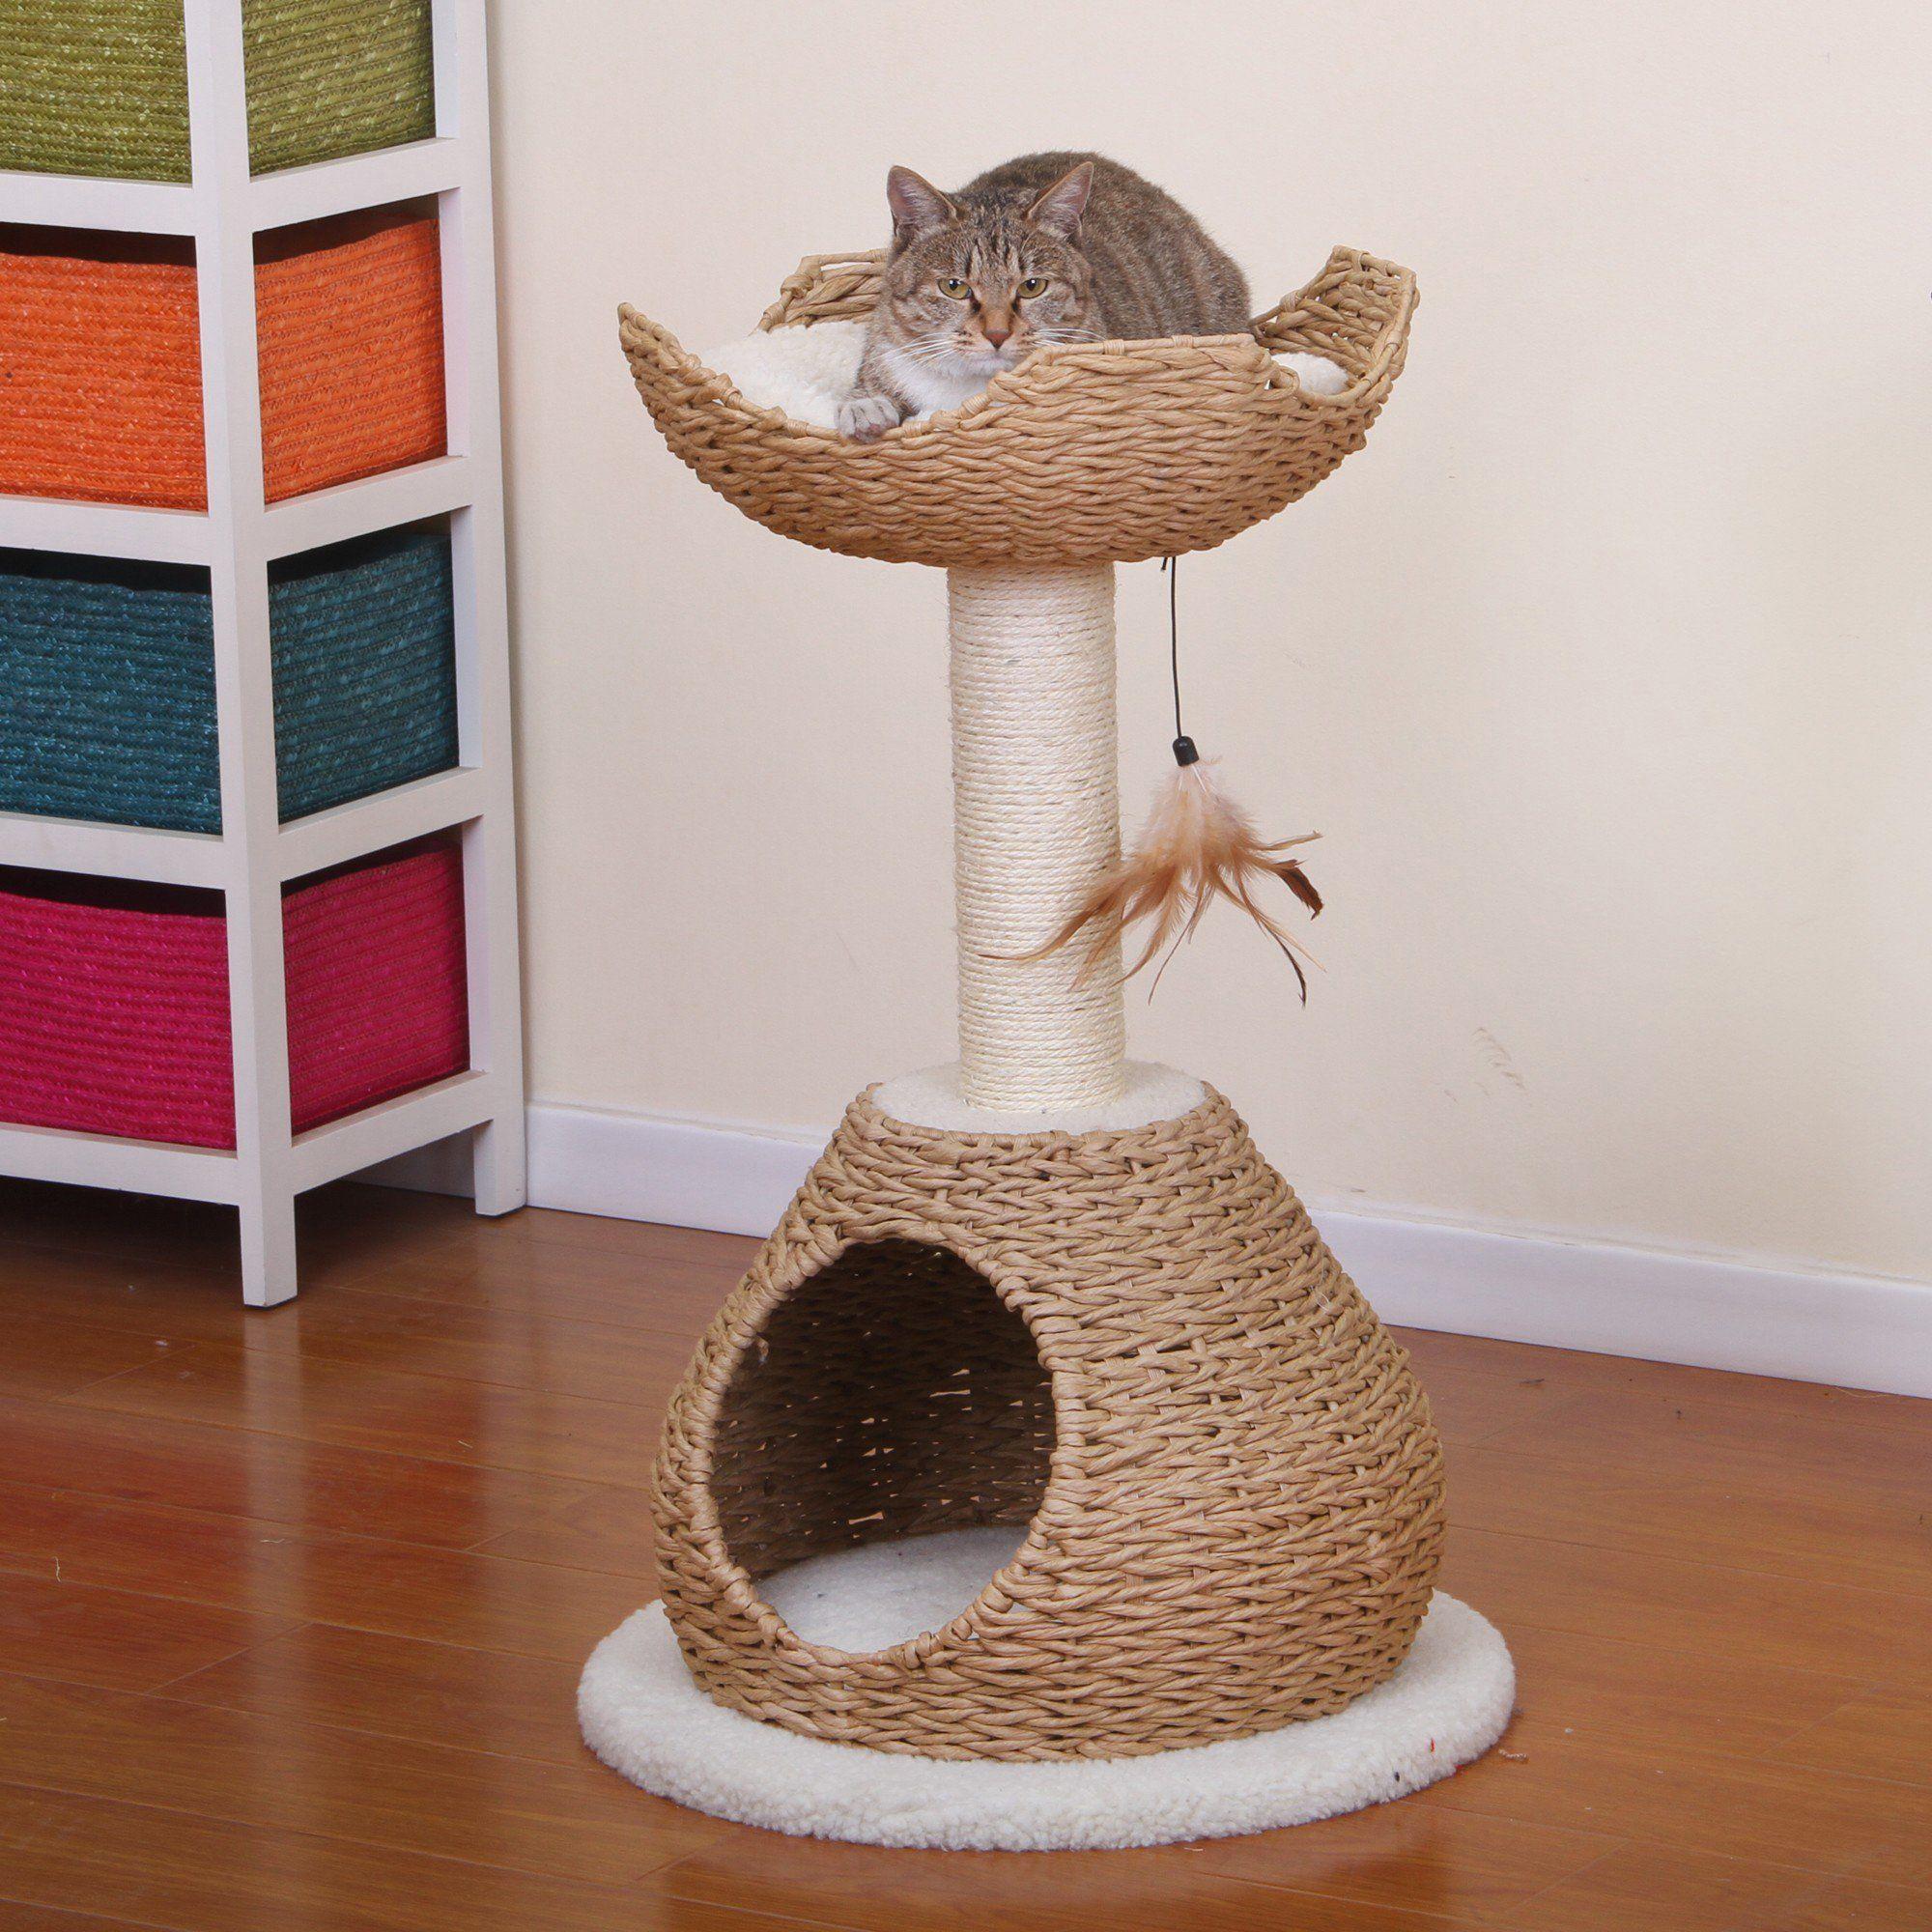 Petpals Group Walkup Natural Color Cat House With Condo Perch 19 L X 19 W X 30 H Petco Cat Tree Cat Condo Cat Furniture